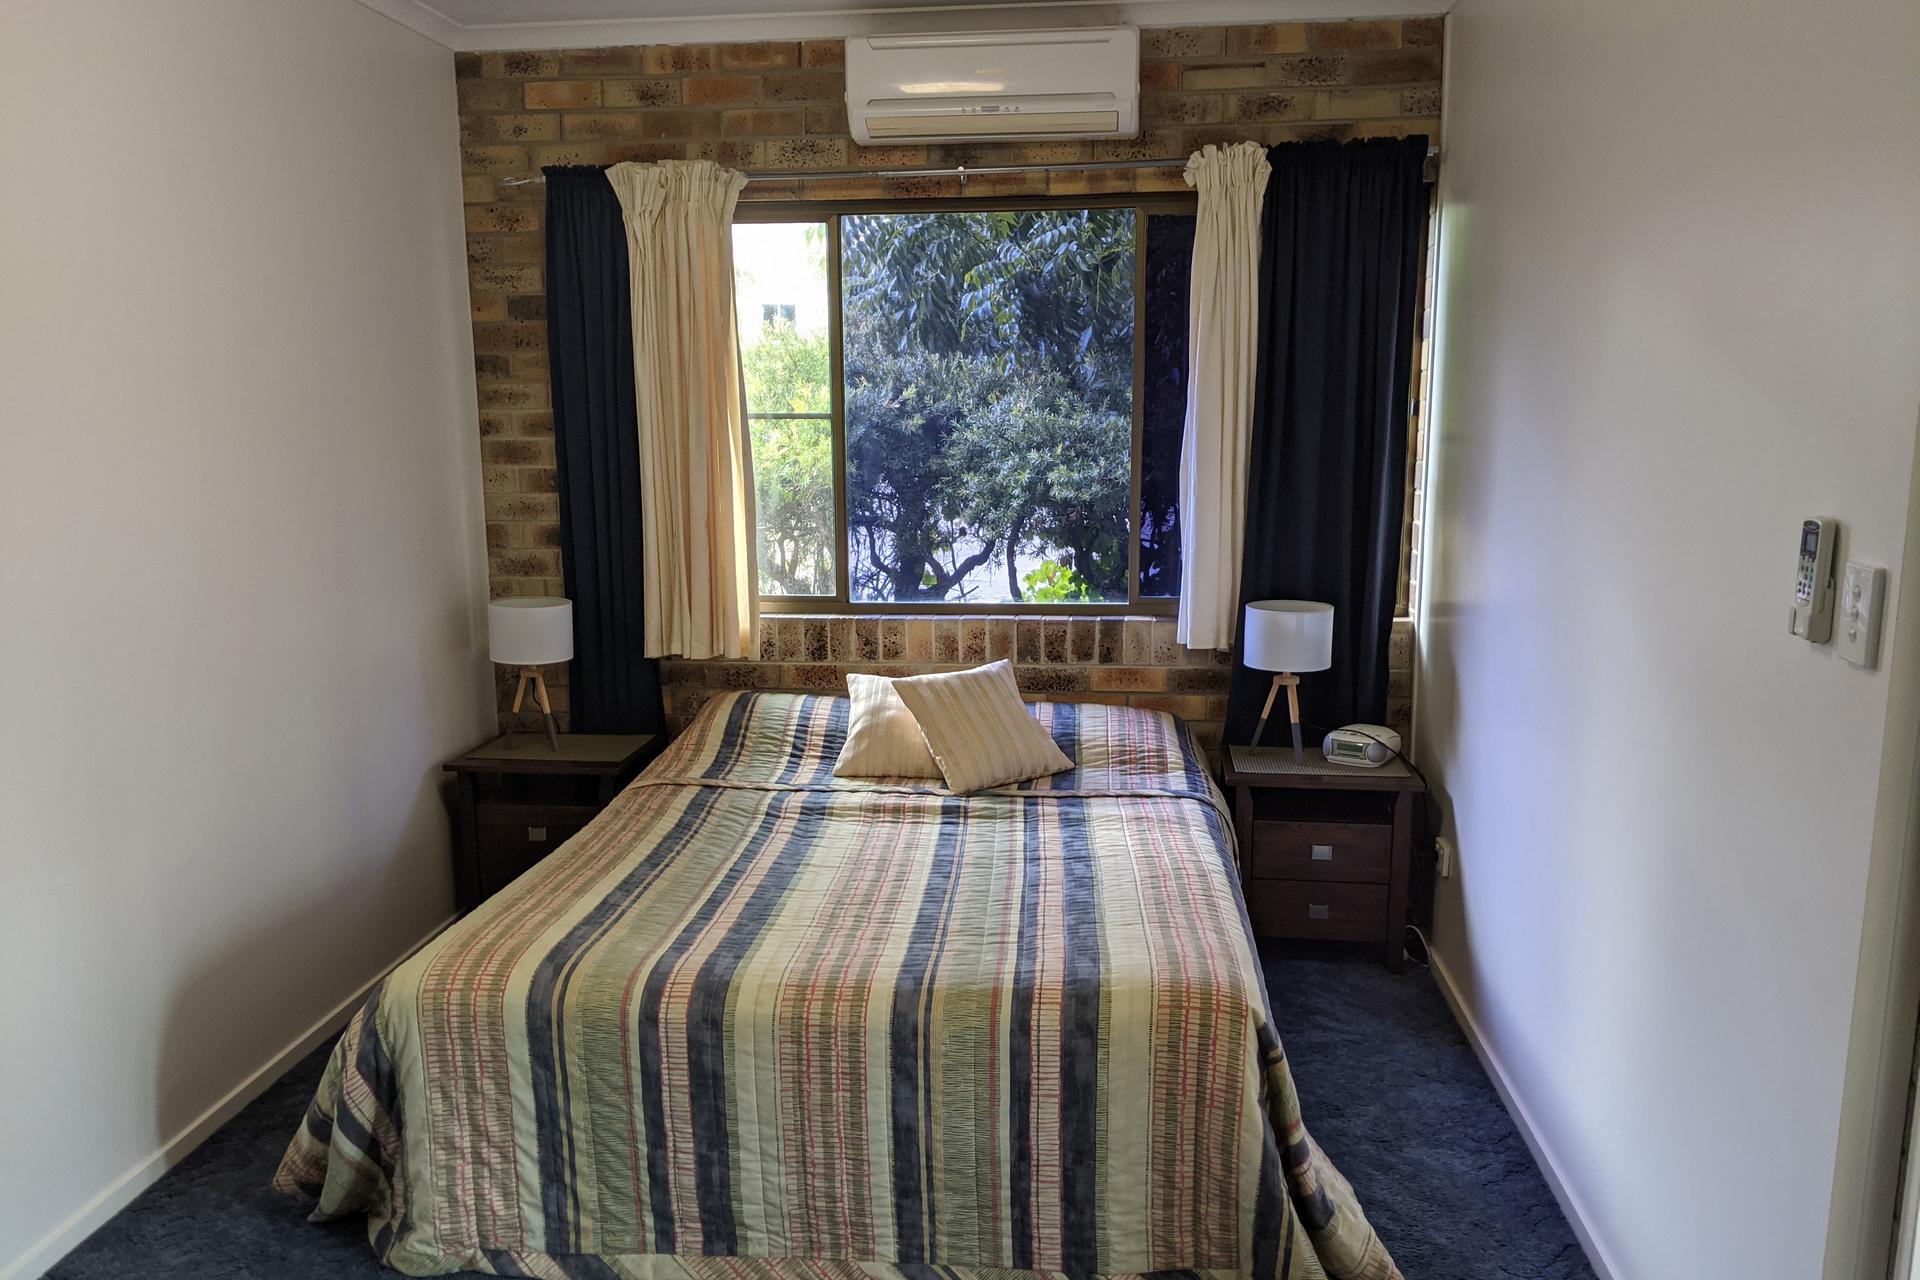 g - Killarney Hotel Motel